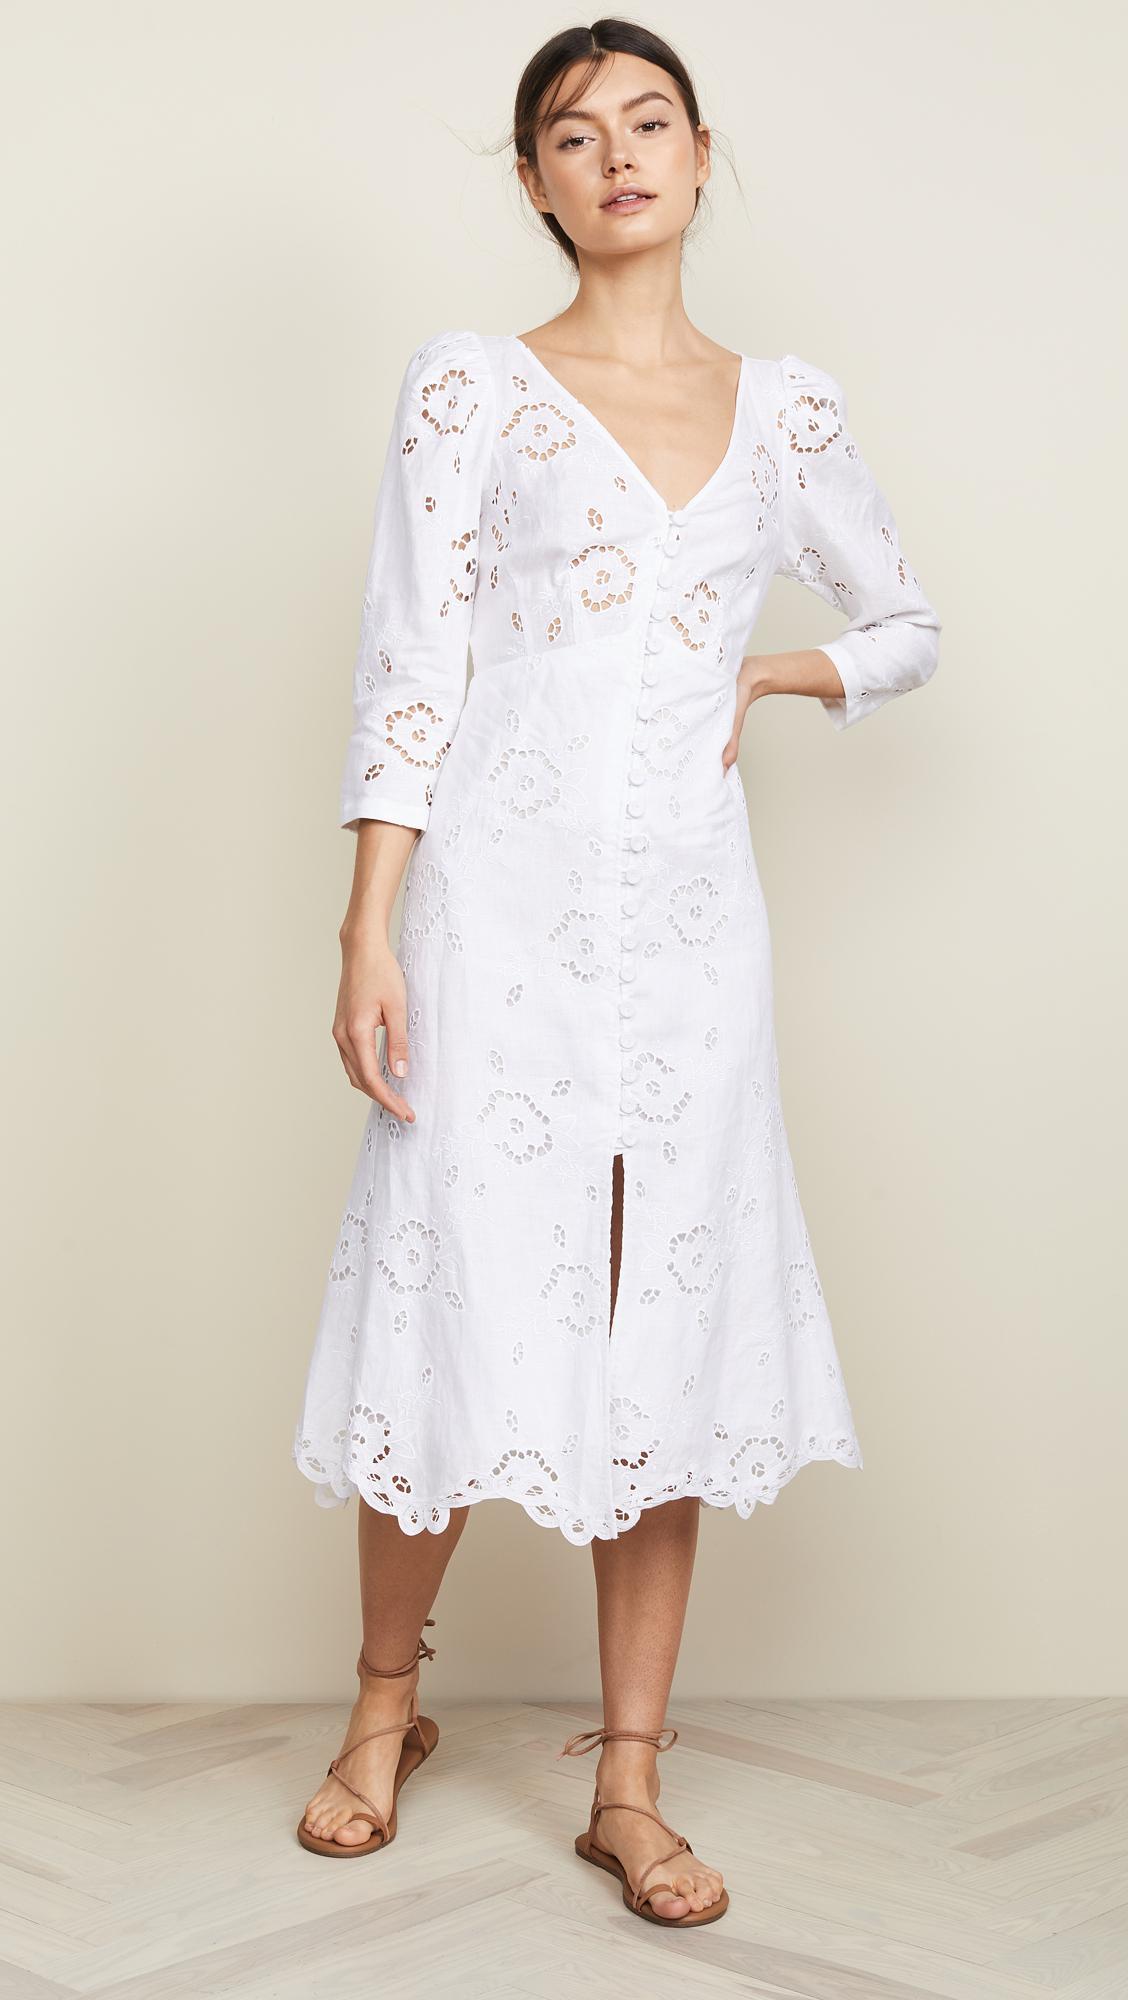 17903548ce Lyst - Rebecca Taylor Linen Terri Dress in White